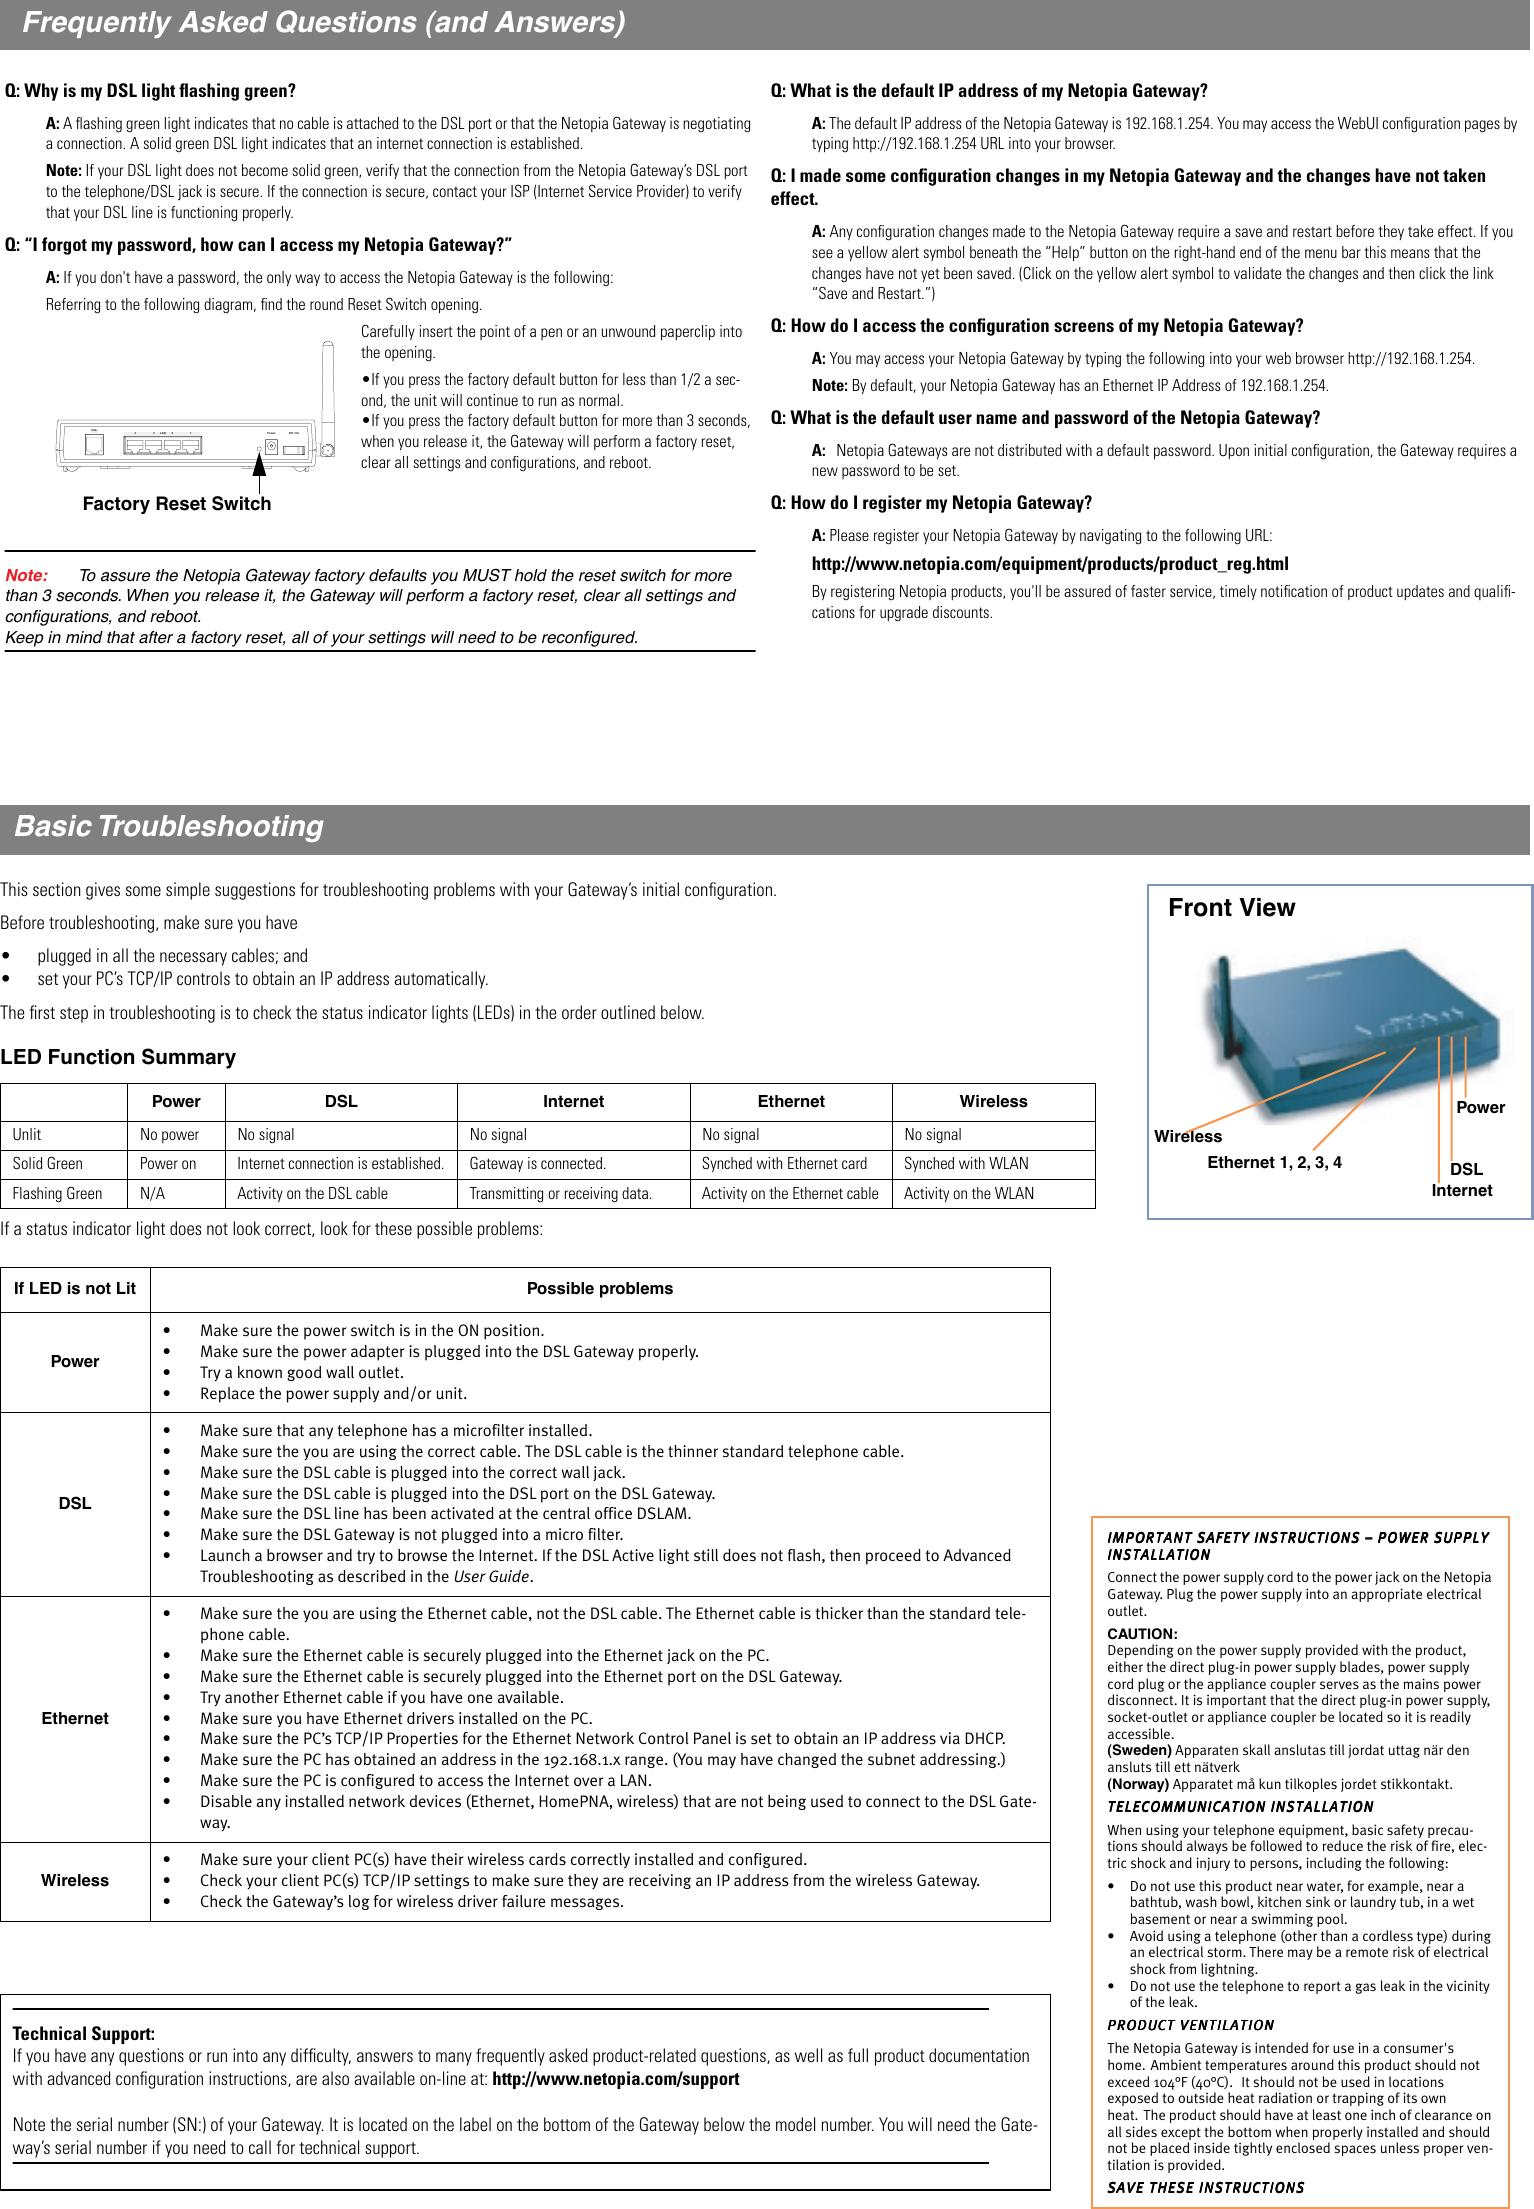 How to configure a motorola / netopia 3347 dsl modem youtube.